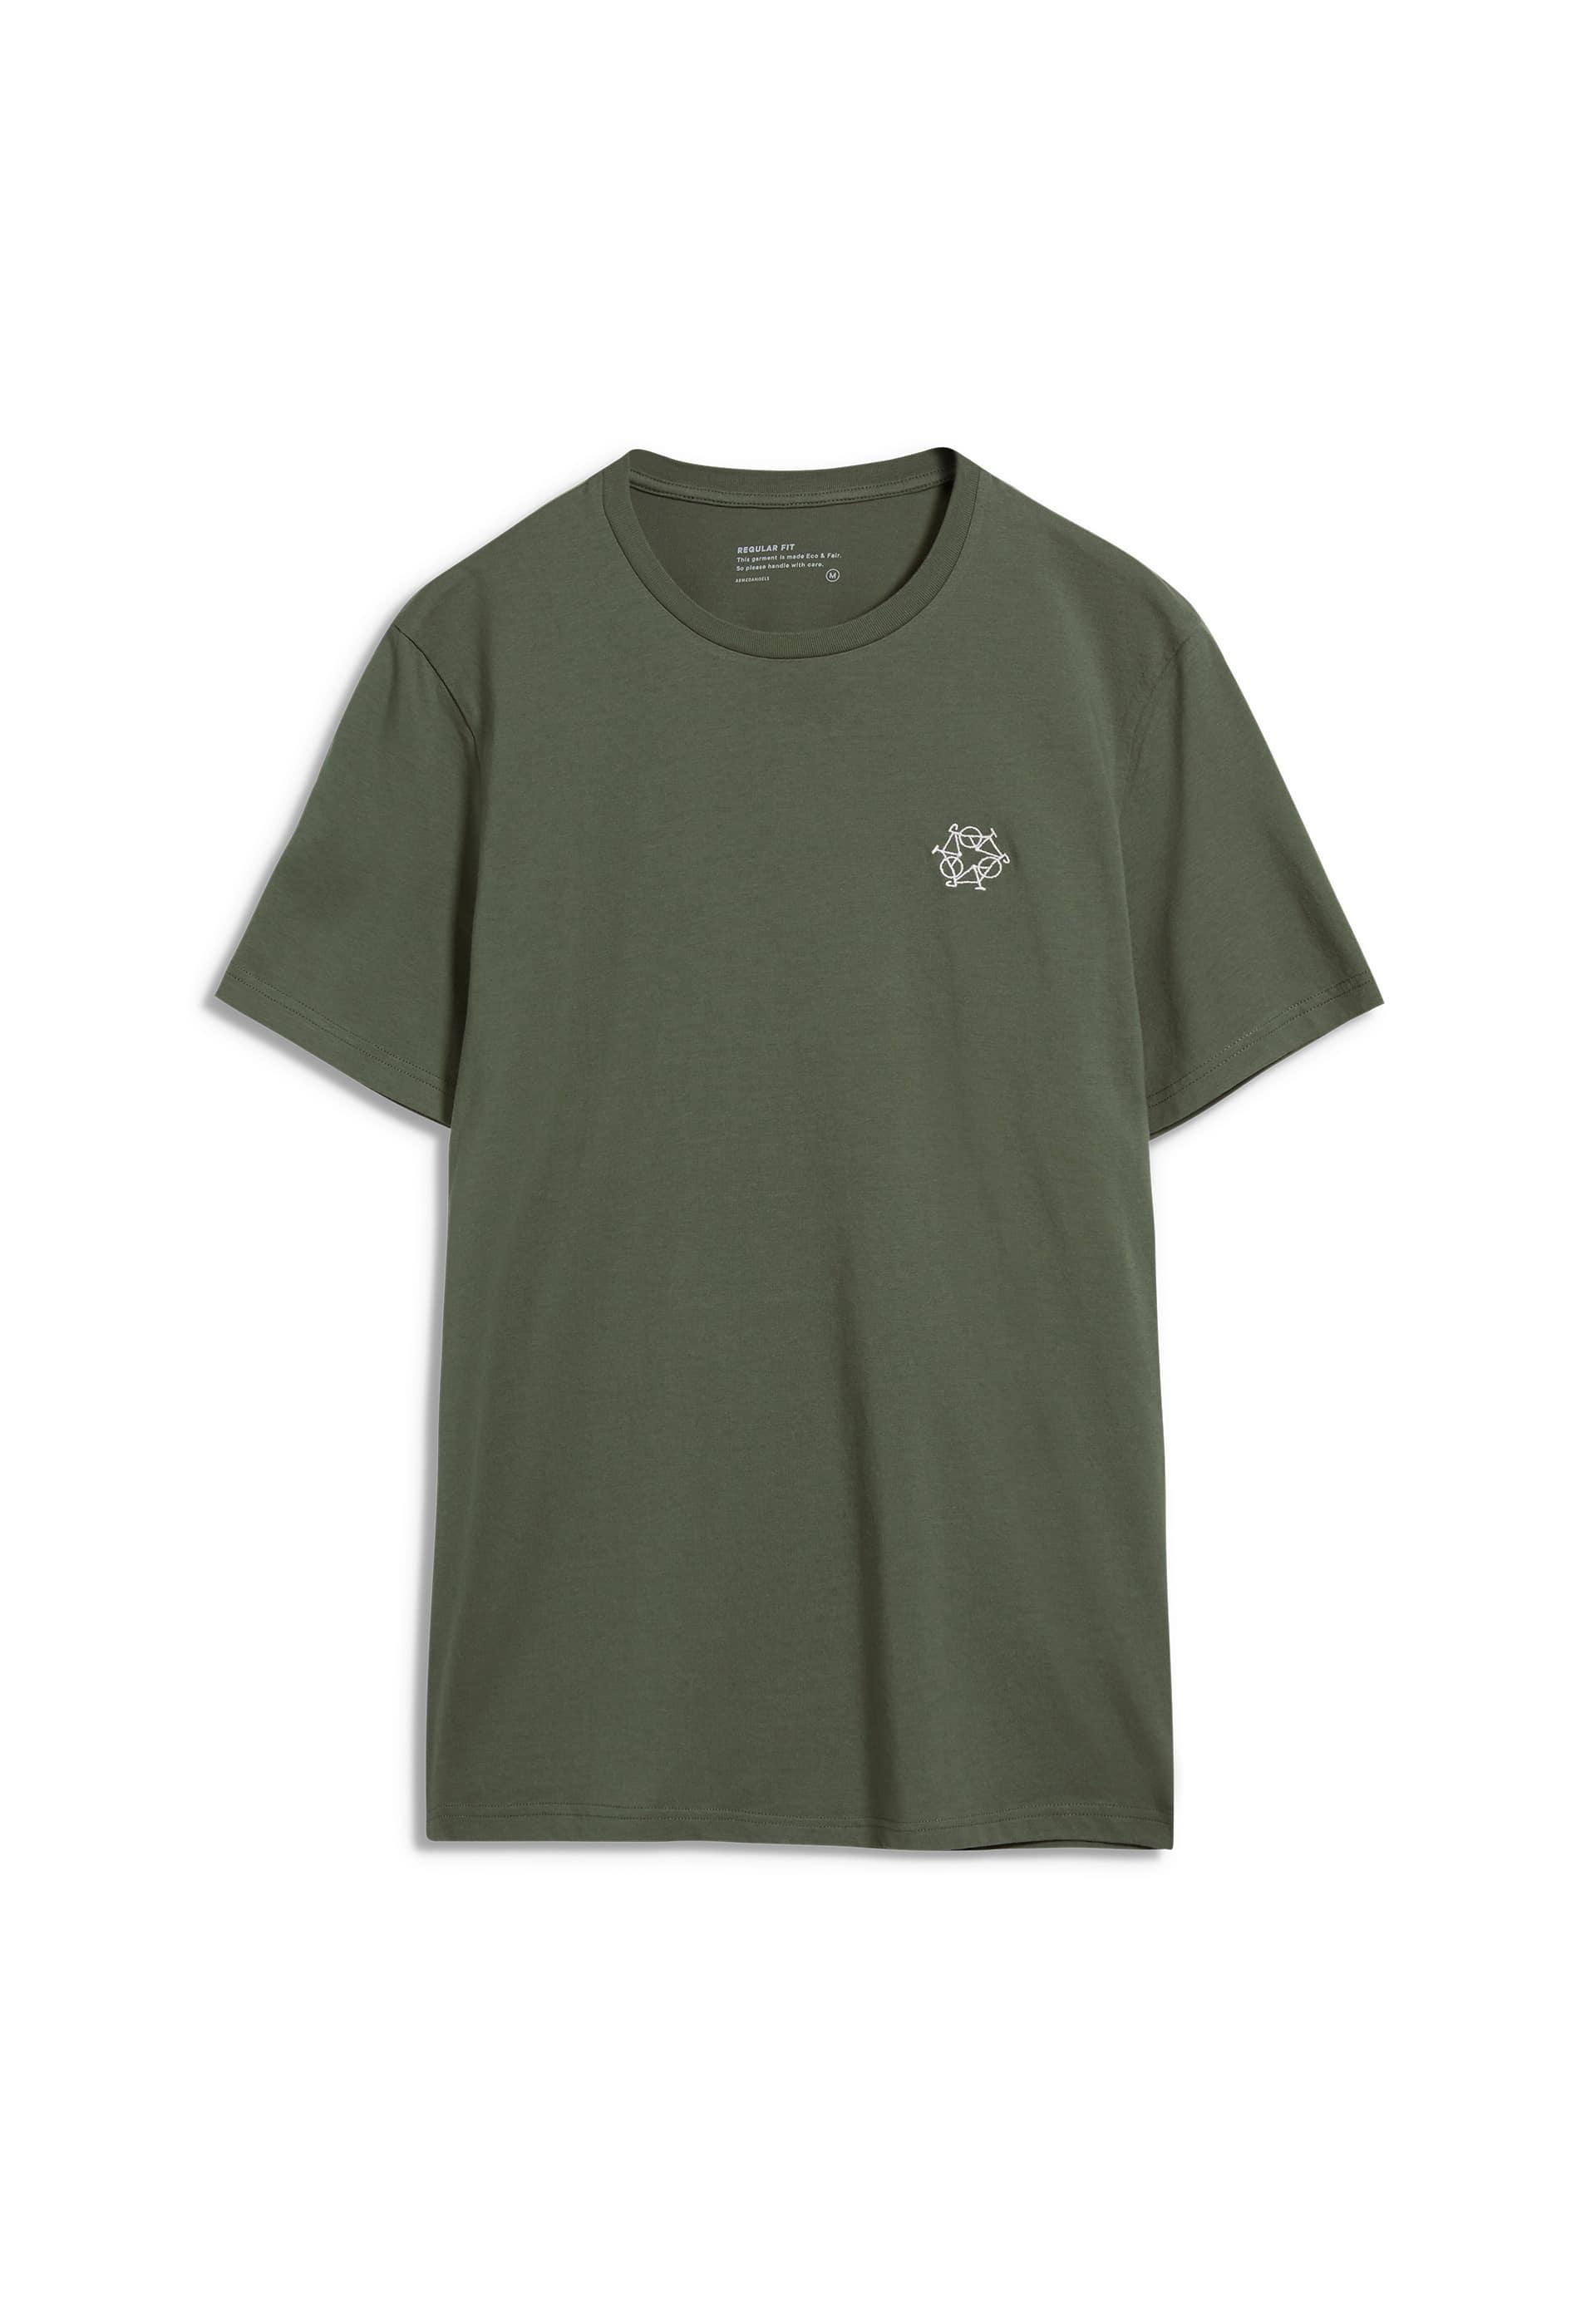 JAAMES BIKE EMBRO T-Shirt made of Organic Cotton